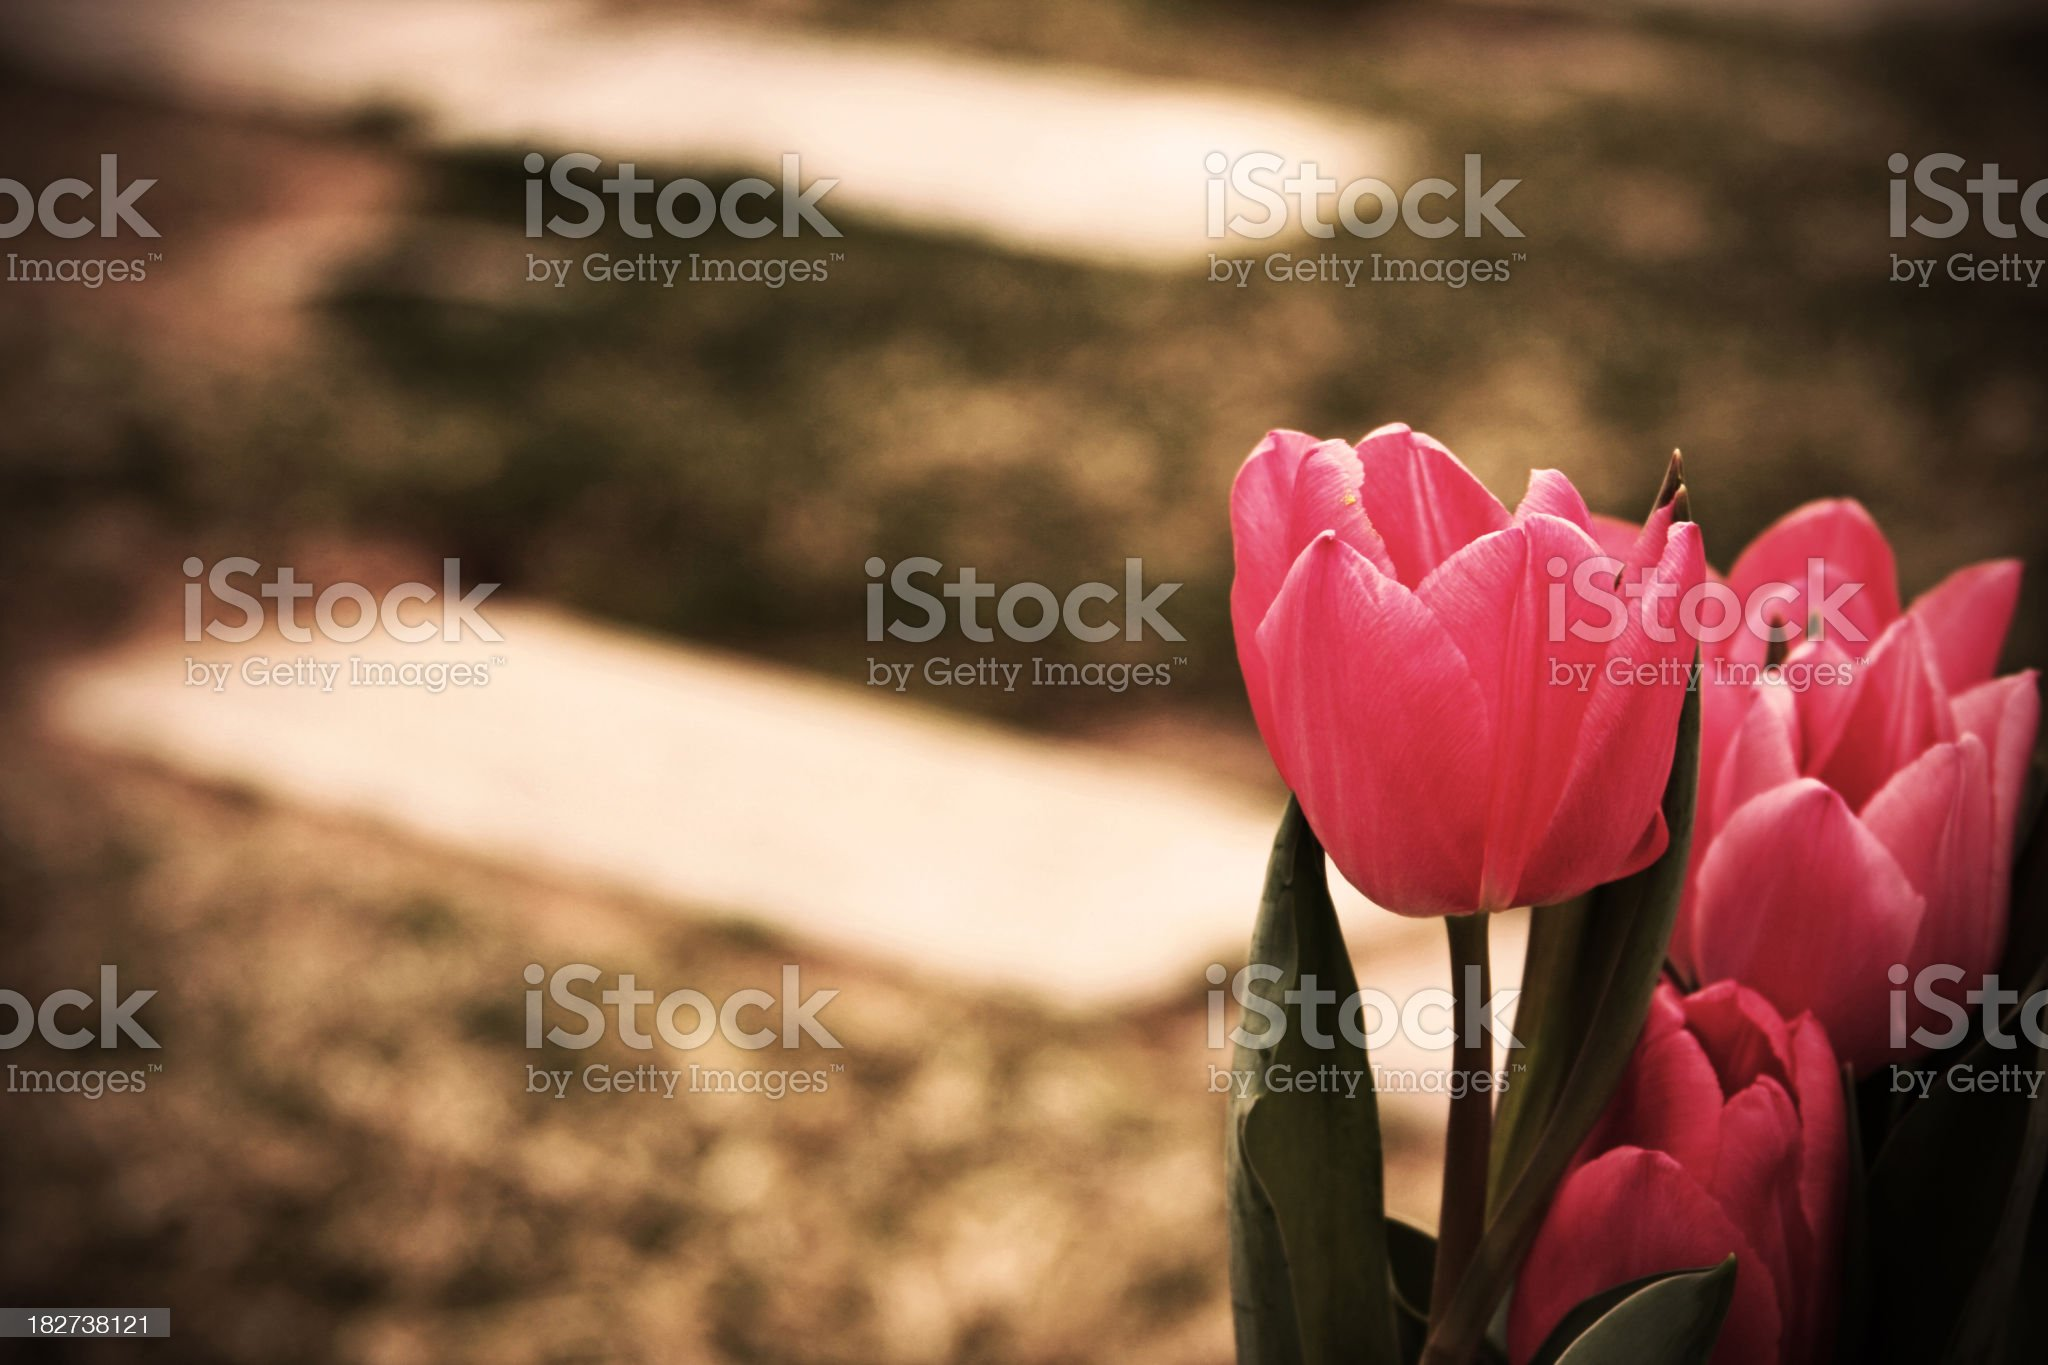 Cemetary Tulips royalty-free stock photo